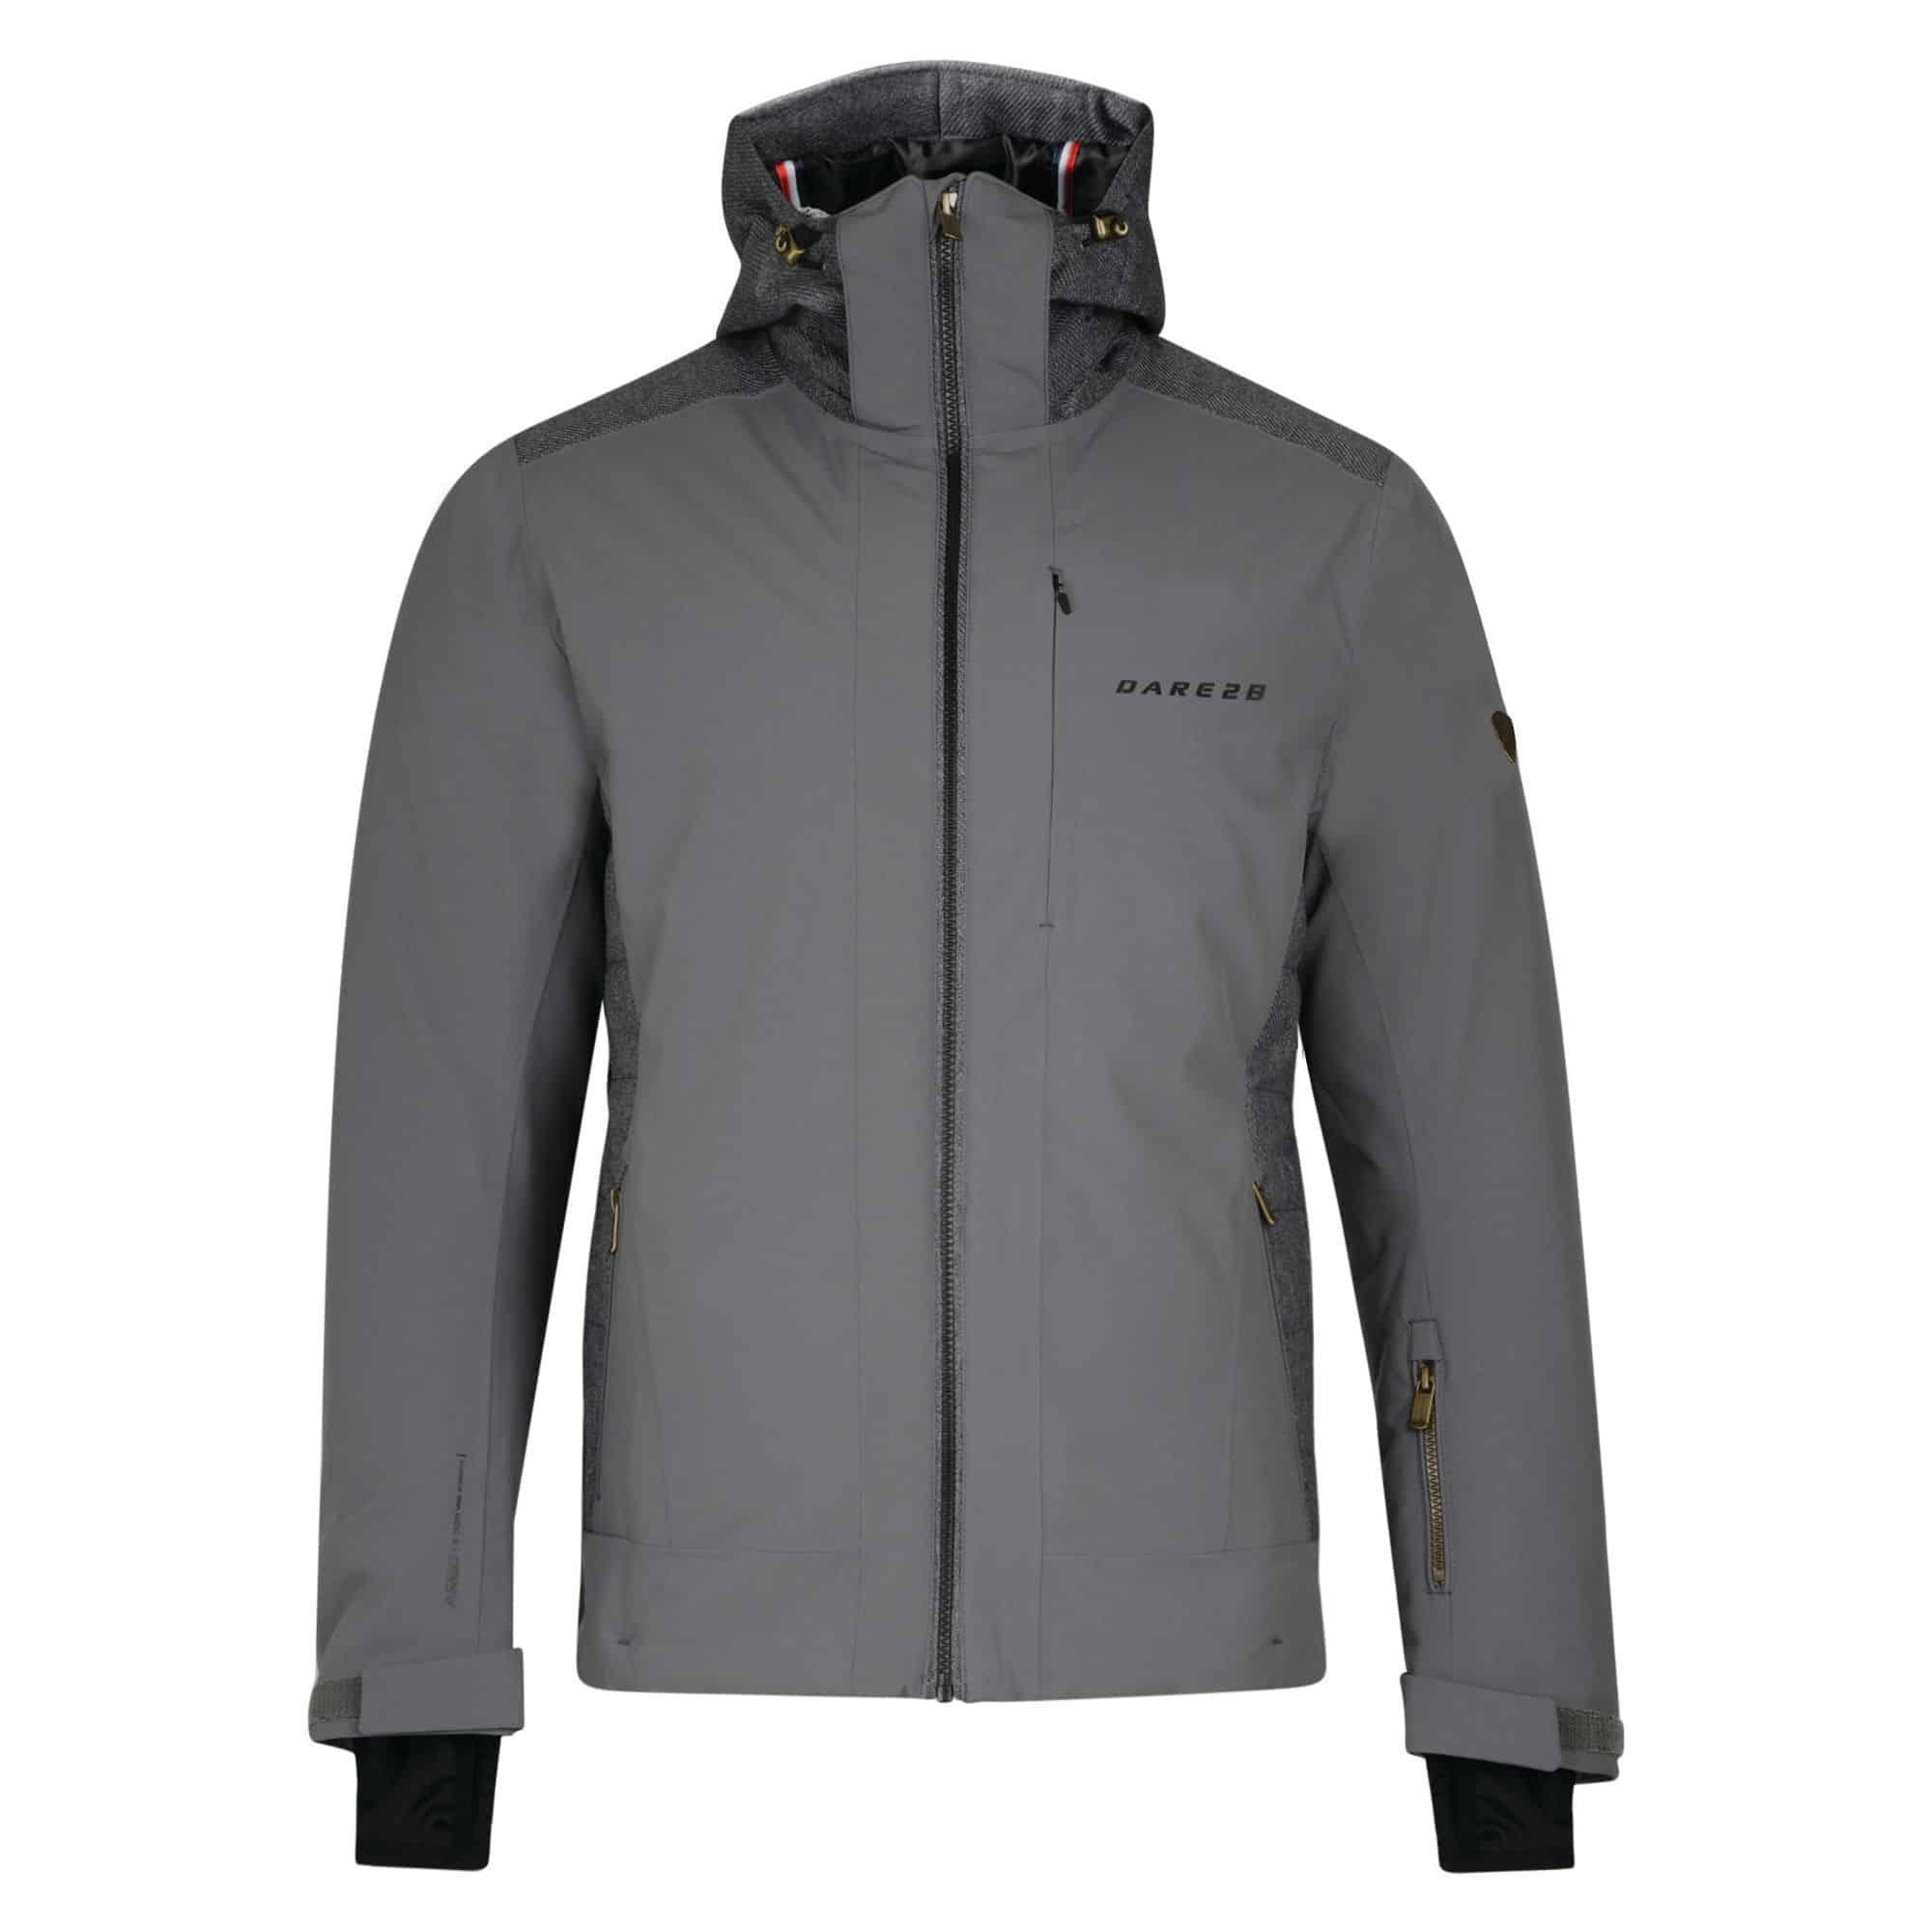 rendition 1718 jacket grey front